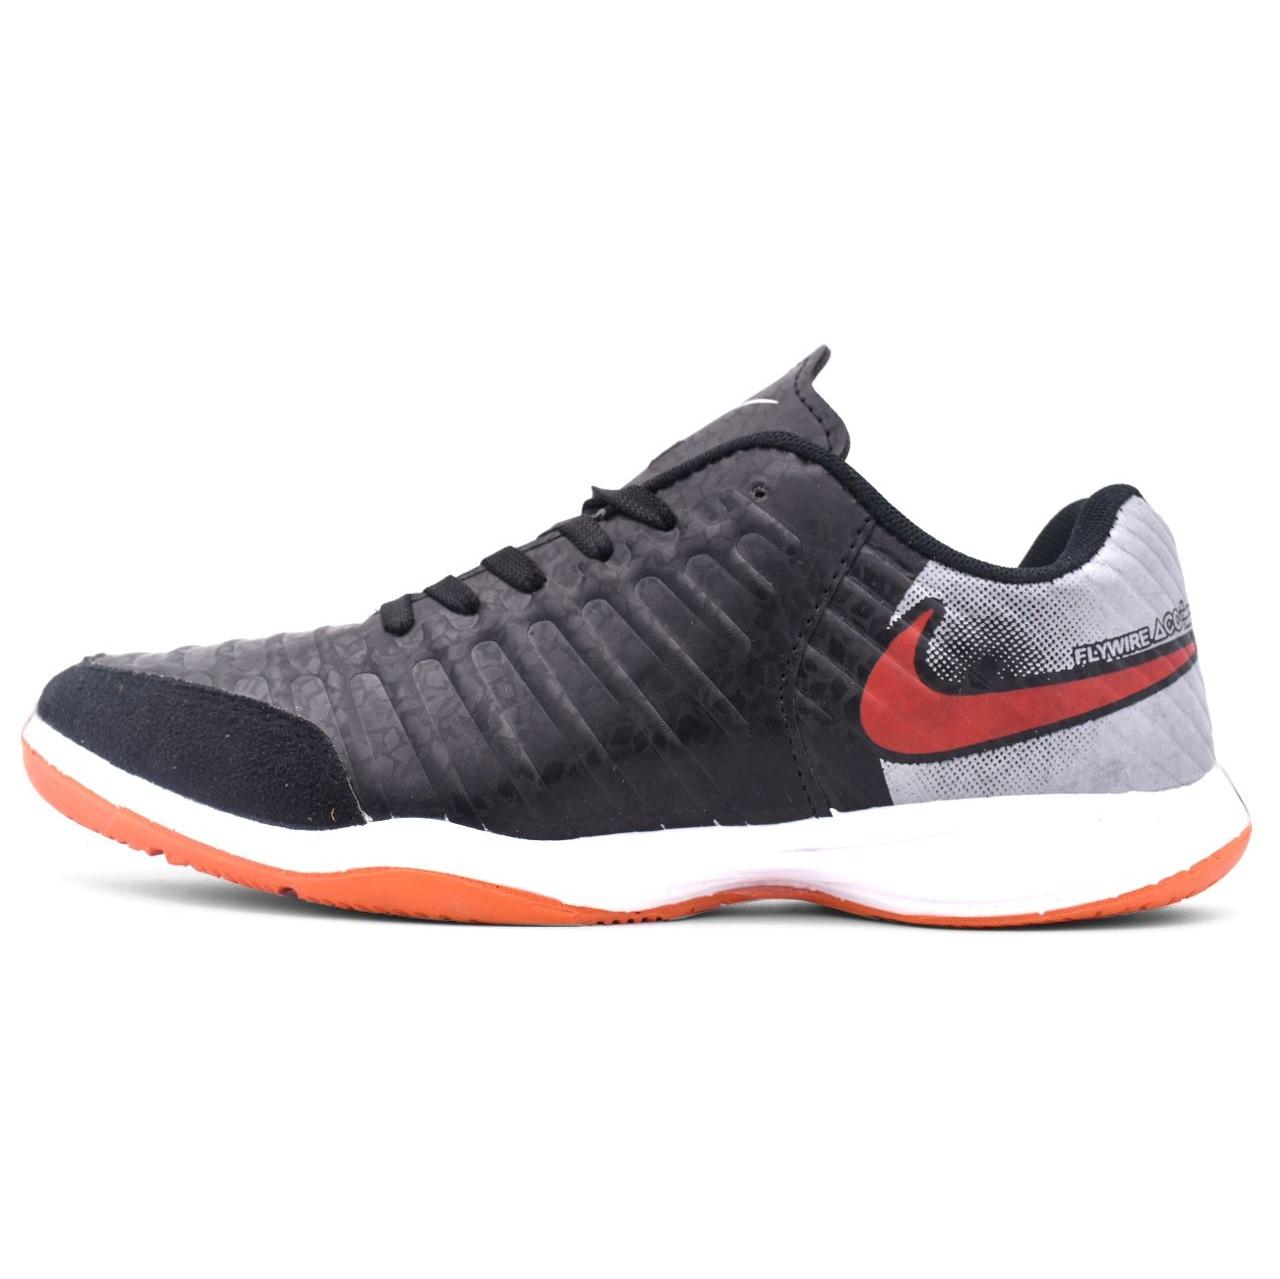 قیمت خرید کفش فوتسال مردانه کد 1002 اورجینال